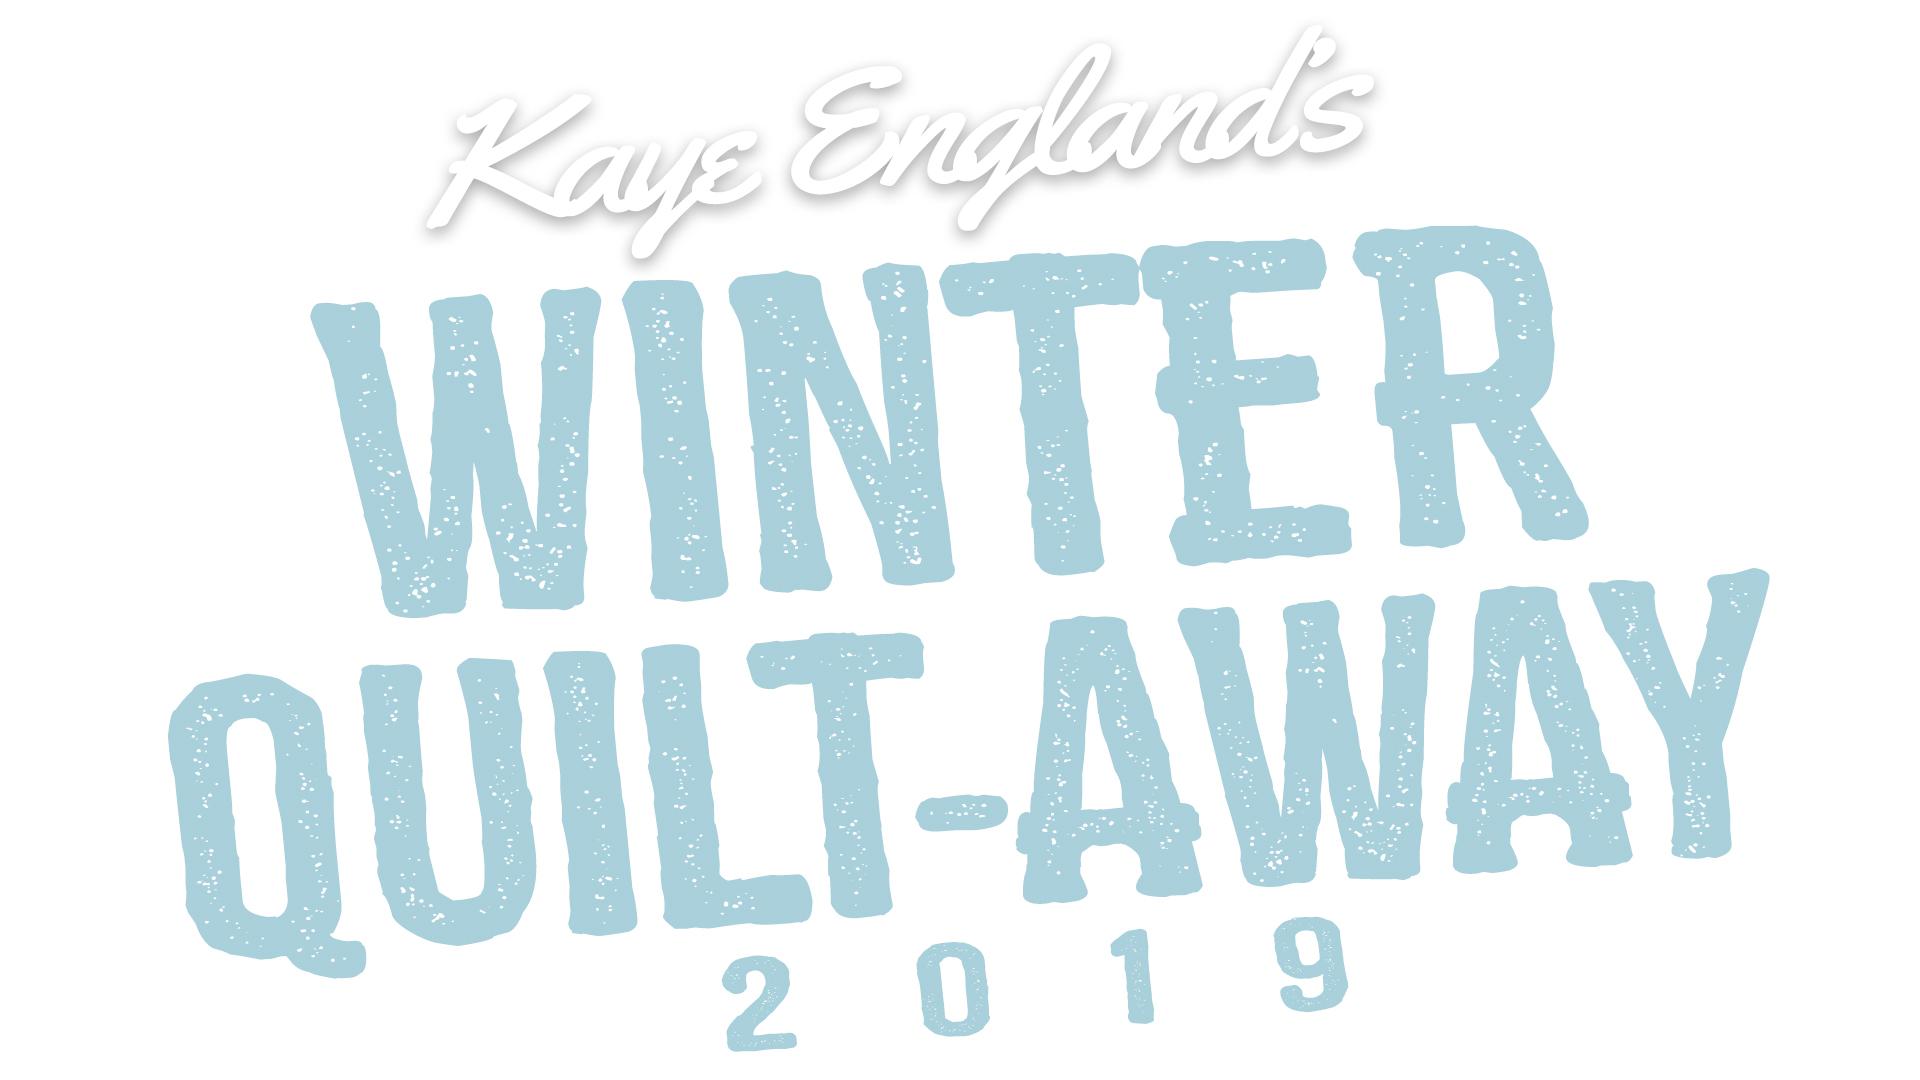 kayes-quiltaway-logo.jpg